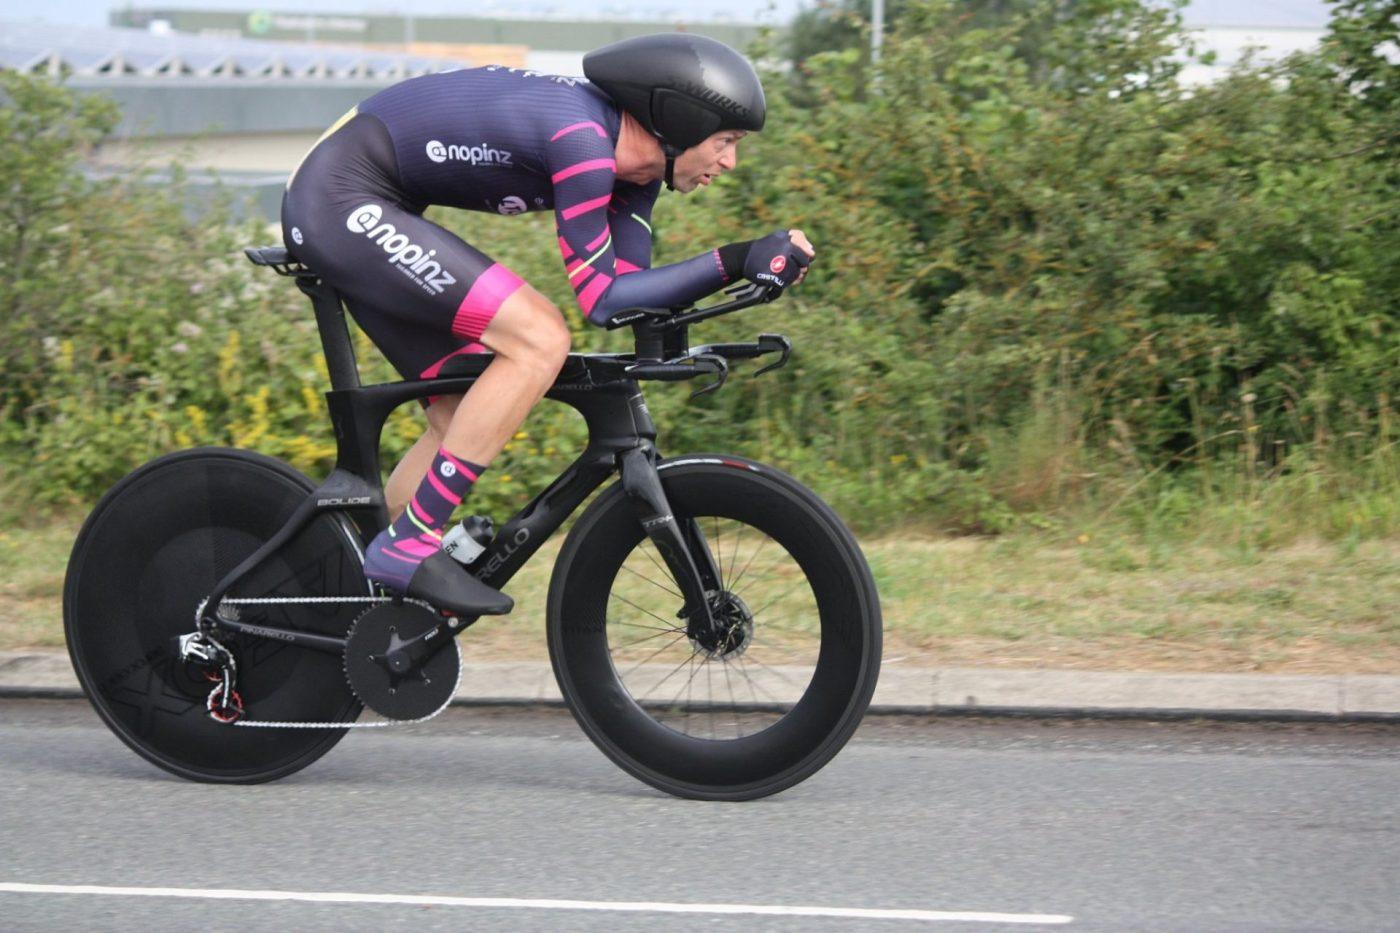 Marcin Bialoblocki Rides 100 Mile Time Trial in 3:13:37 3